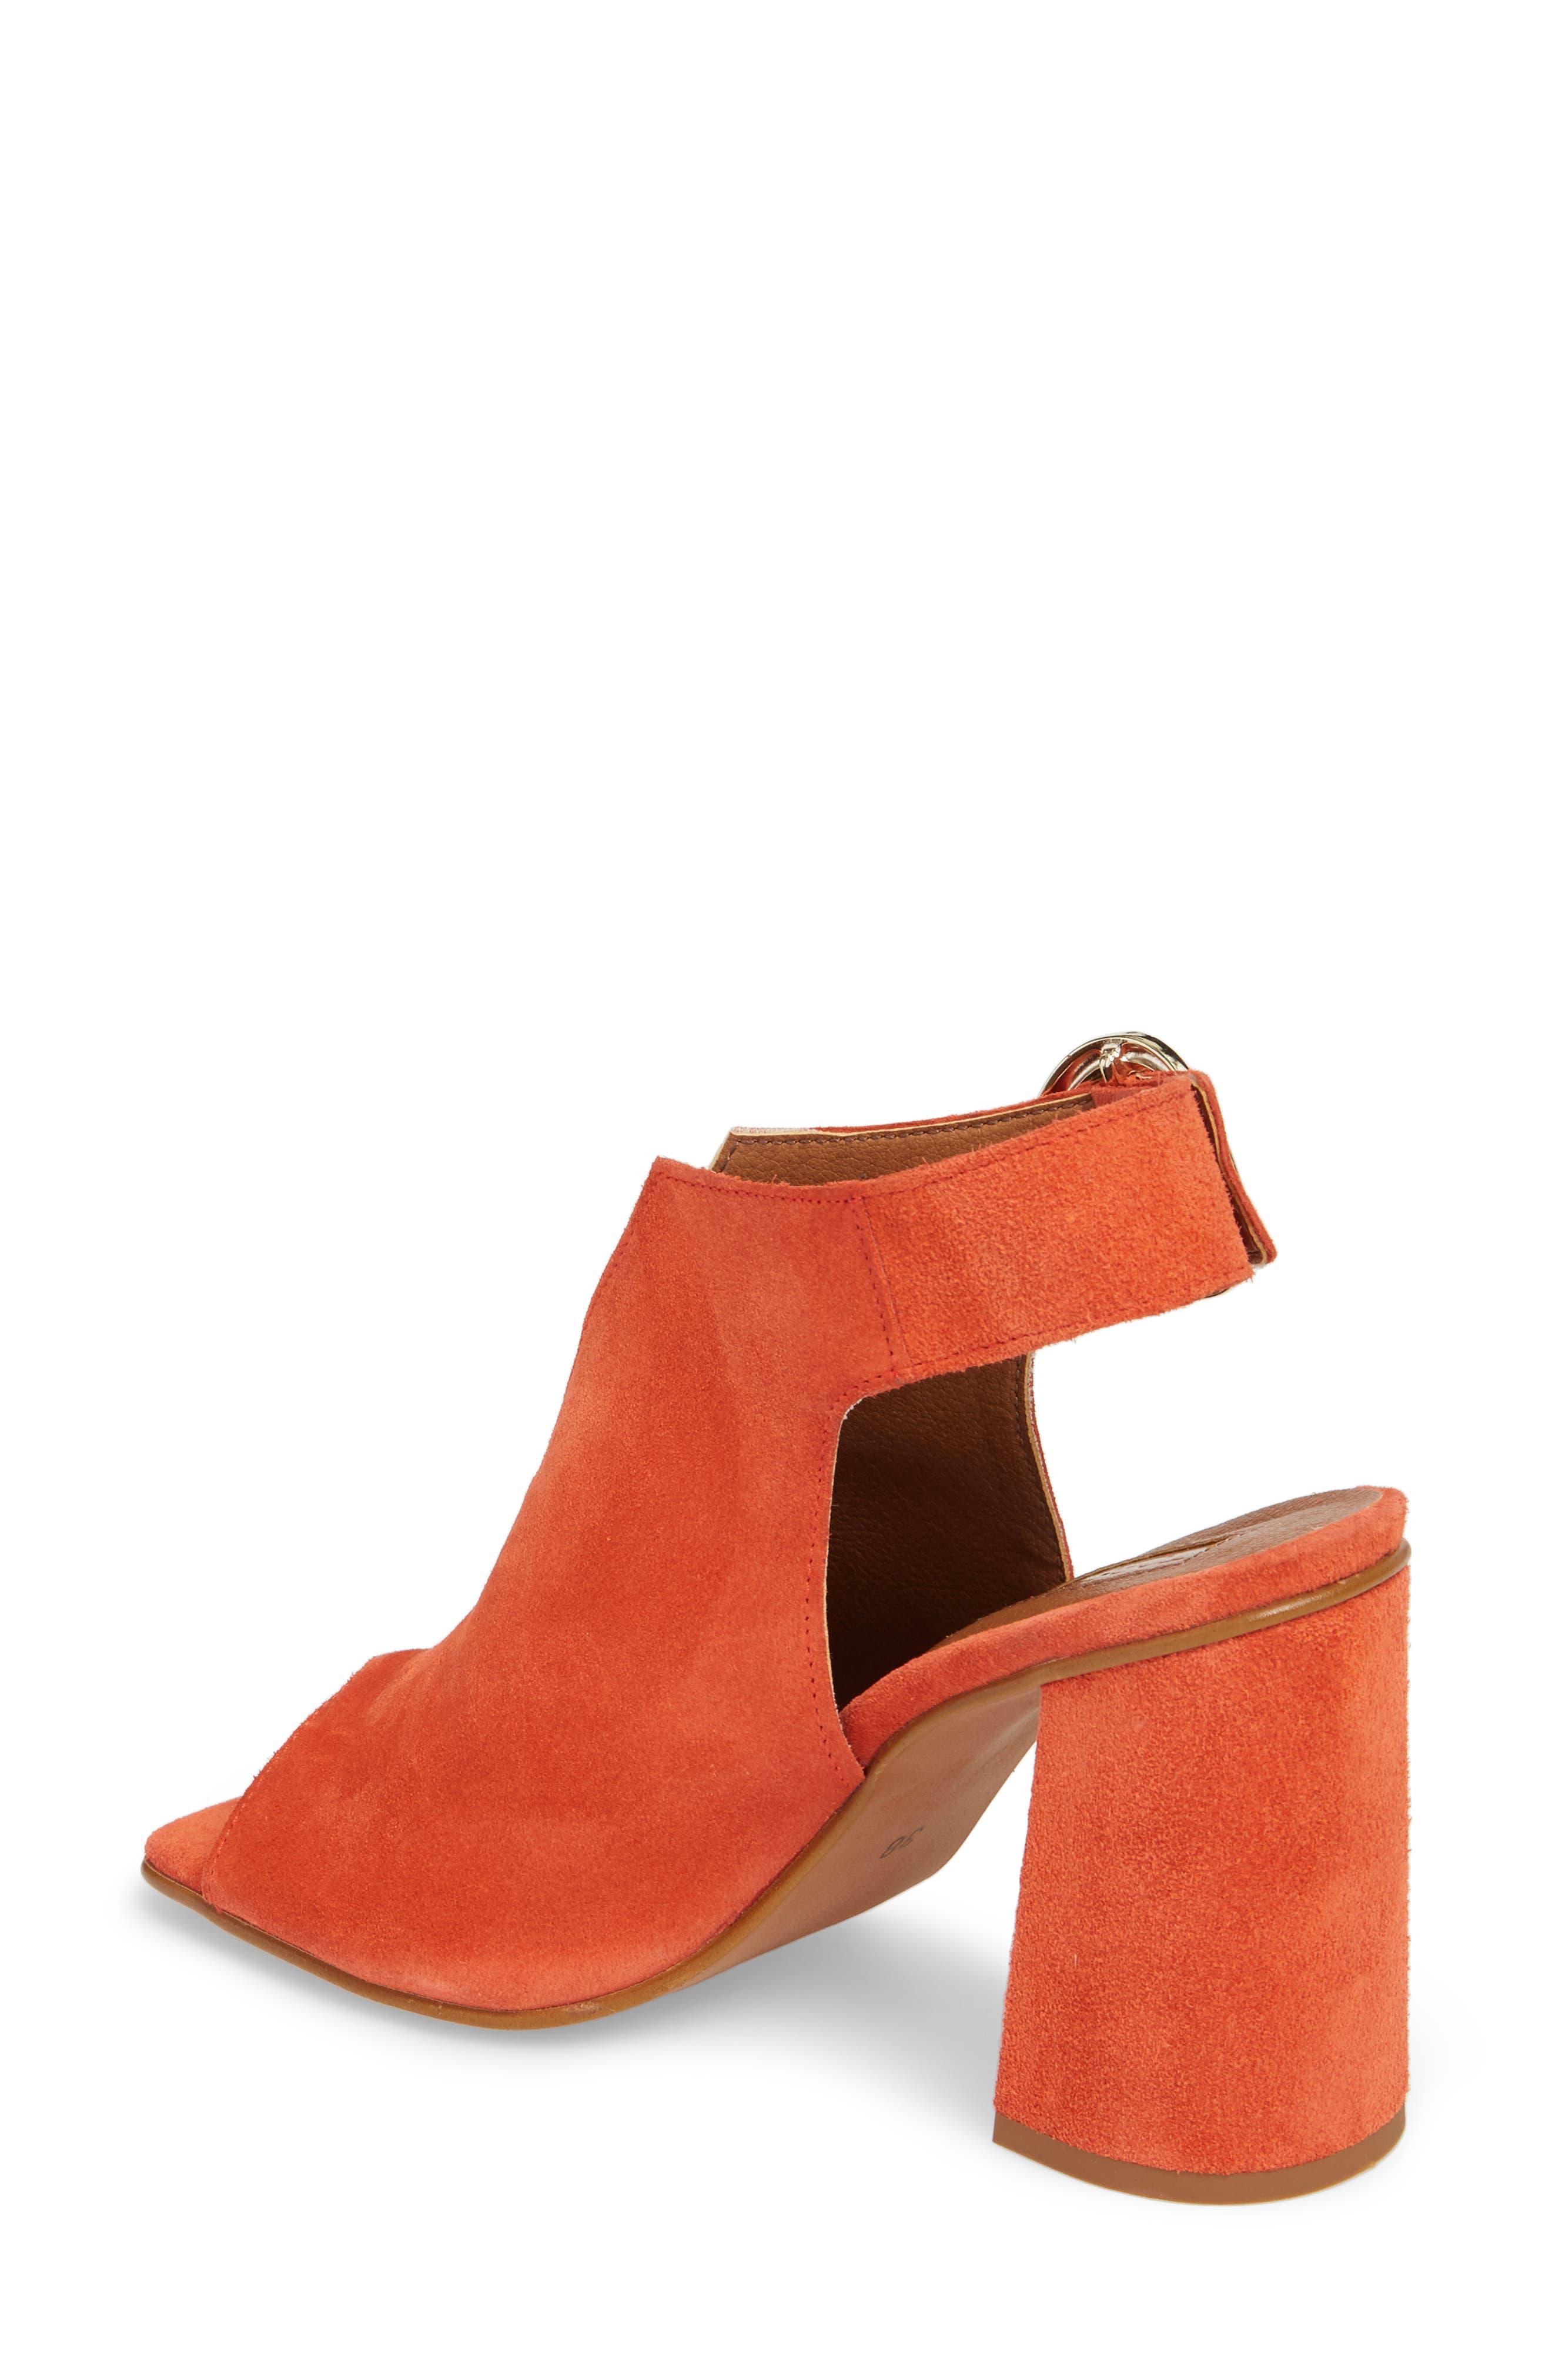 Nika Flared Heel Slingback Sandal,                             Alternate thumbnail 2, color,                             Orange